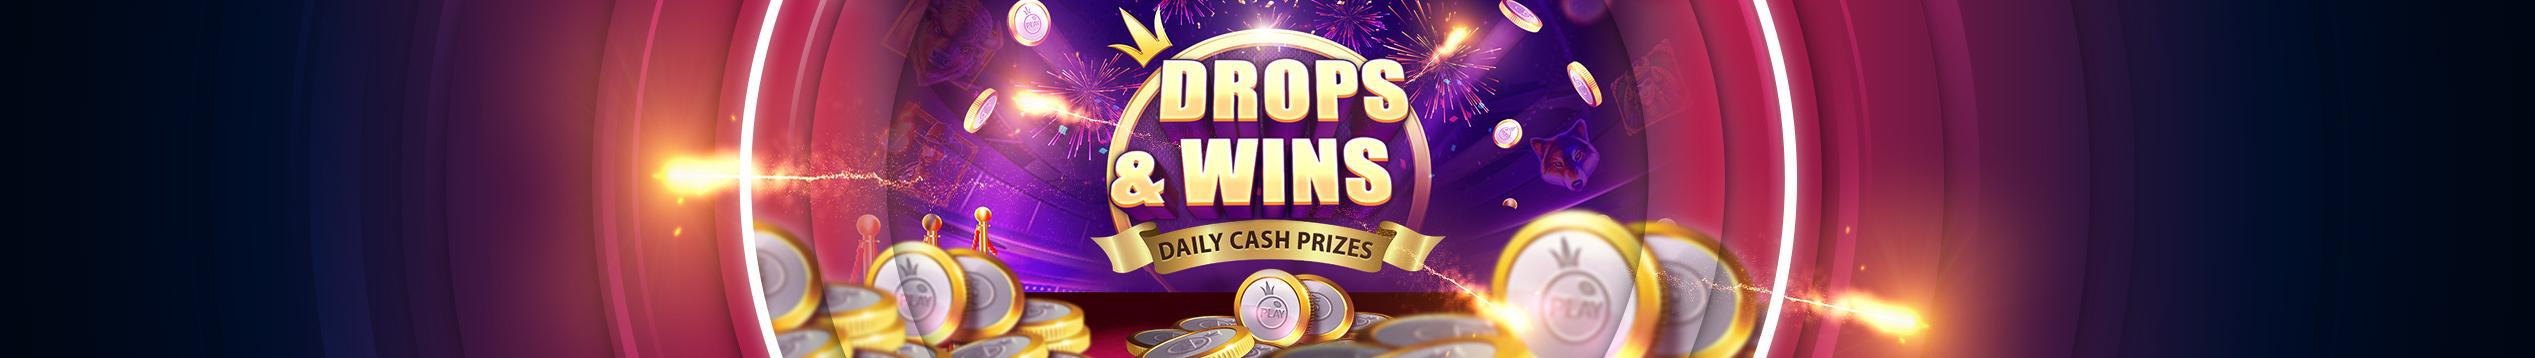 €2,000,000 Prize Pool